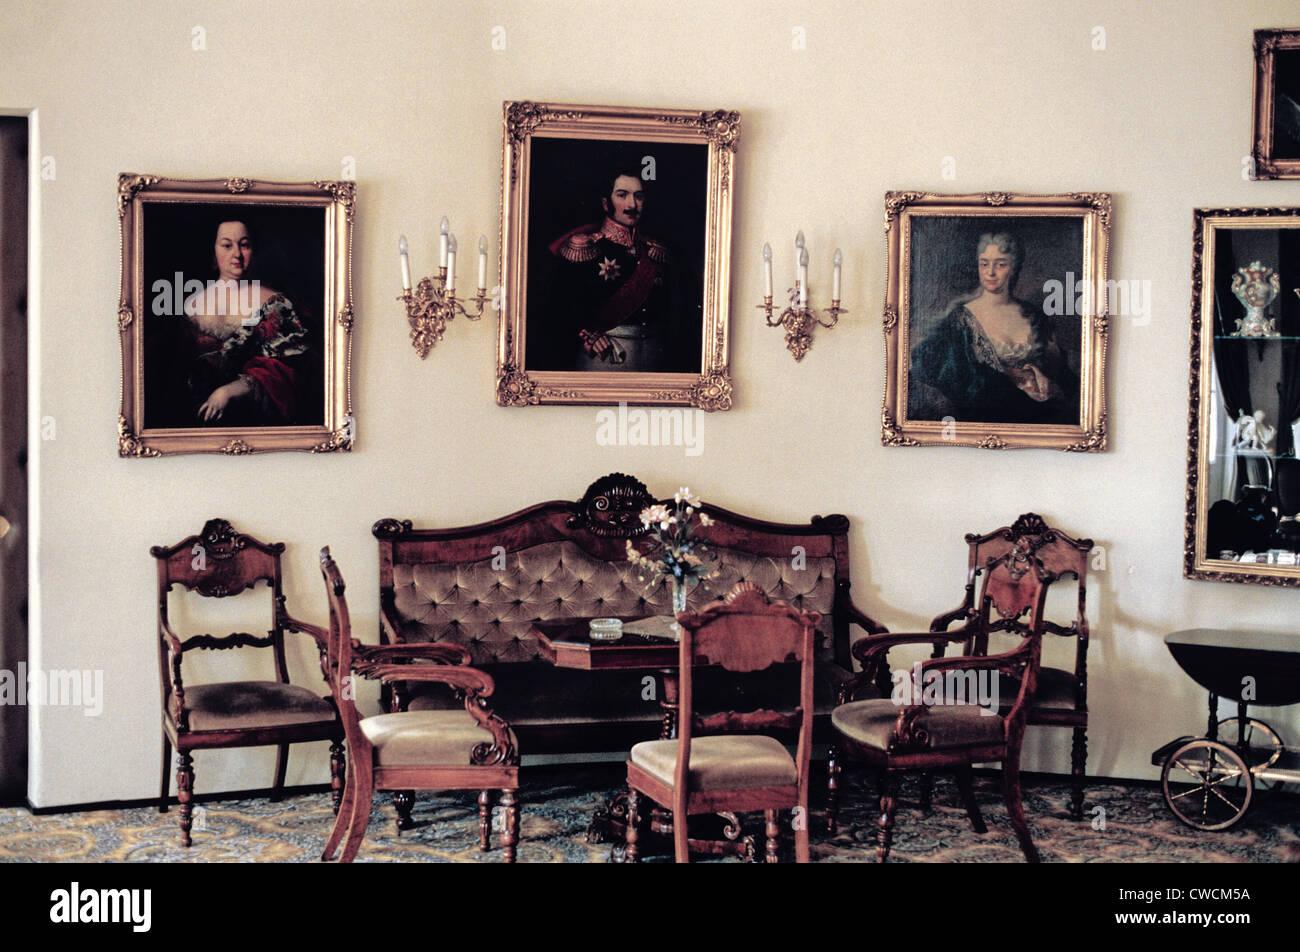 Sitting Room in the Hotel Haikko Manor Spa, Porvoo, Finland - Stock Image